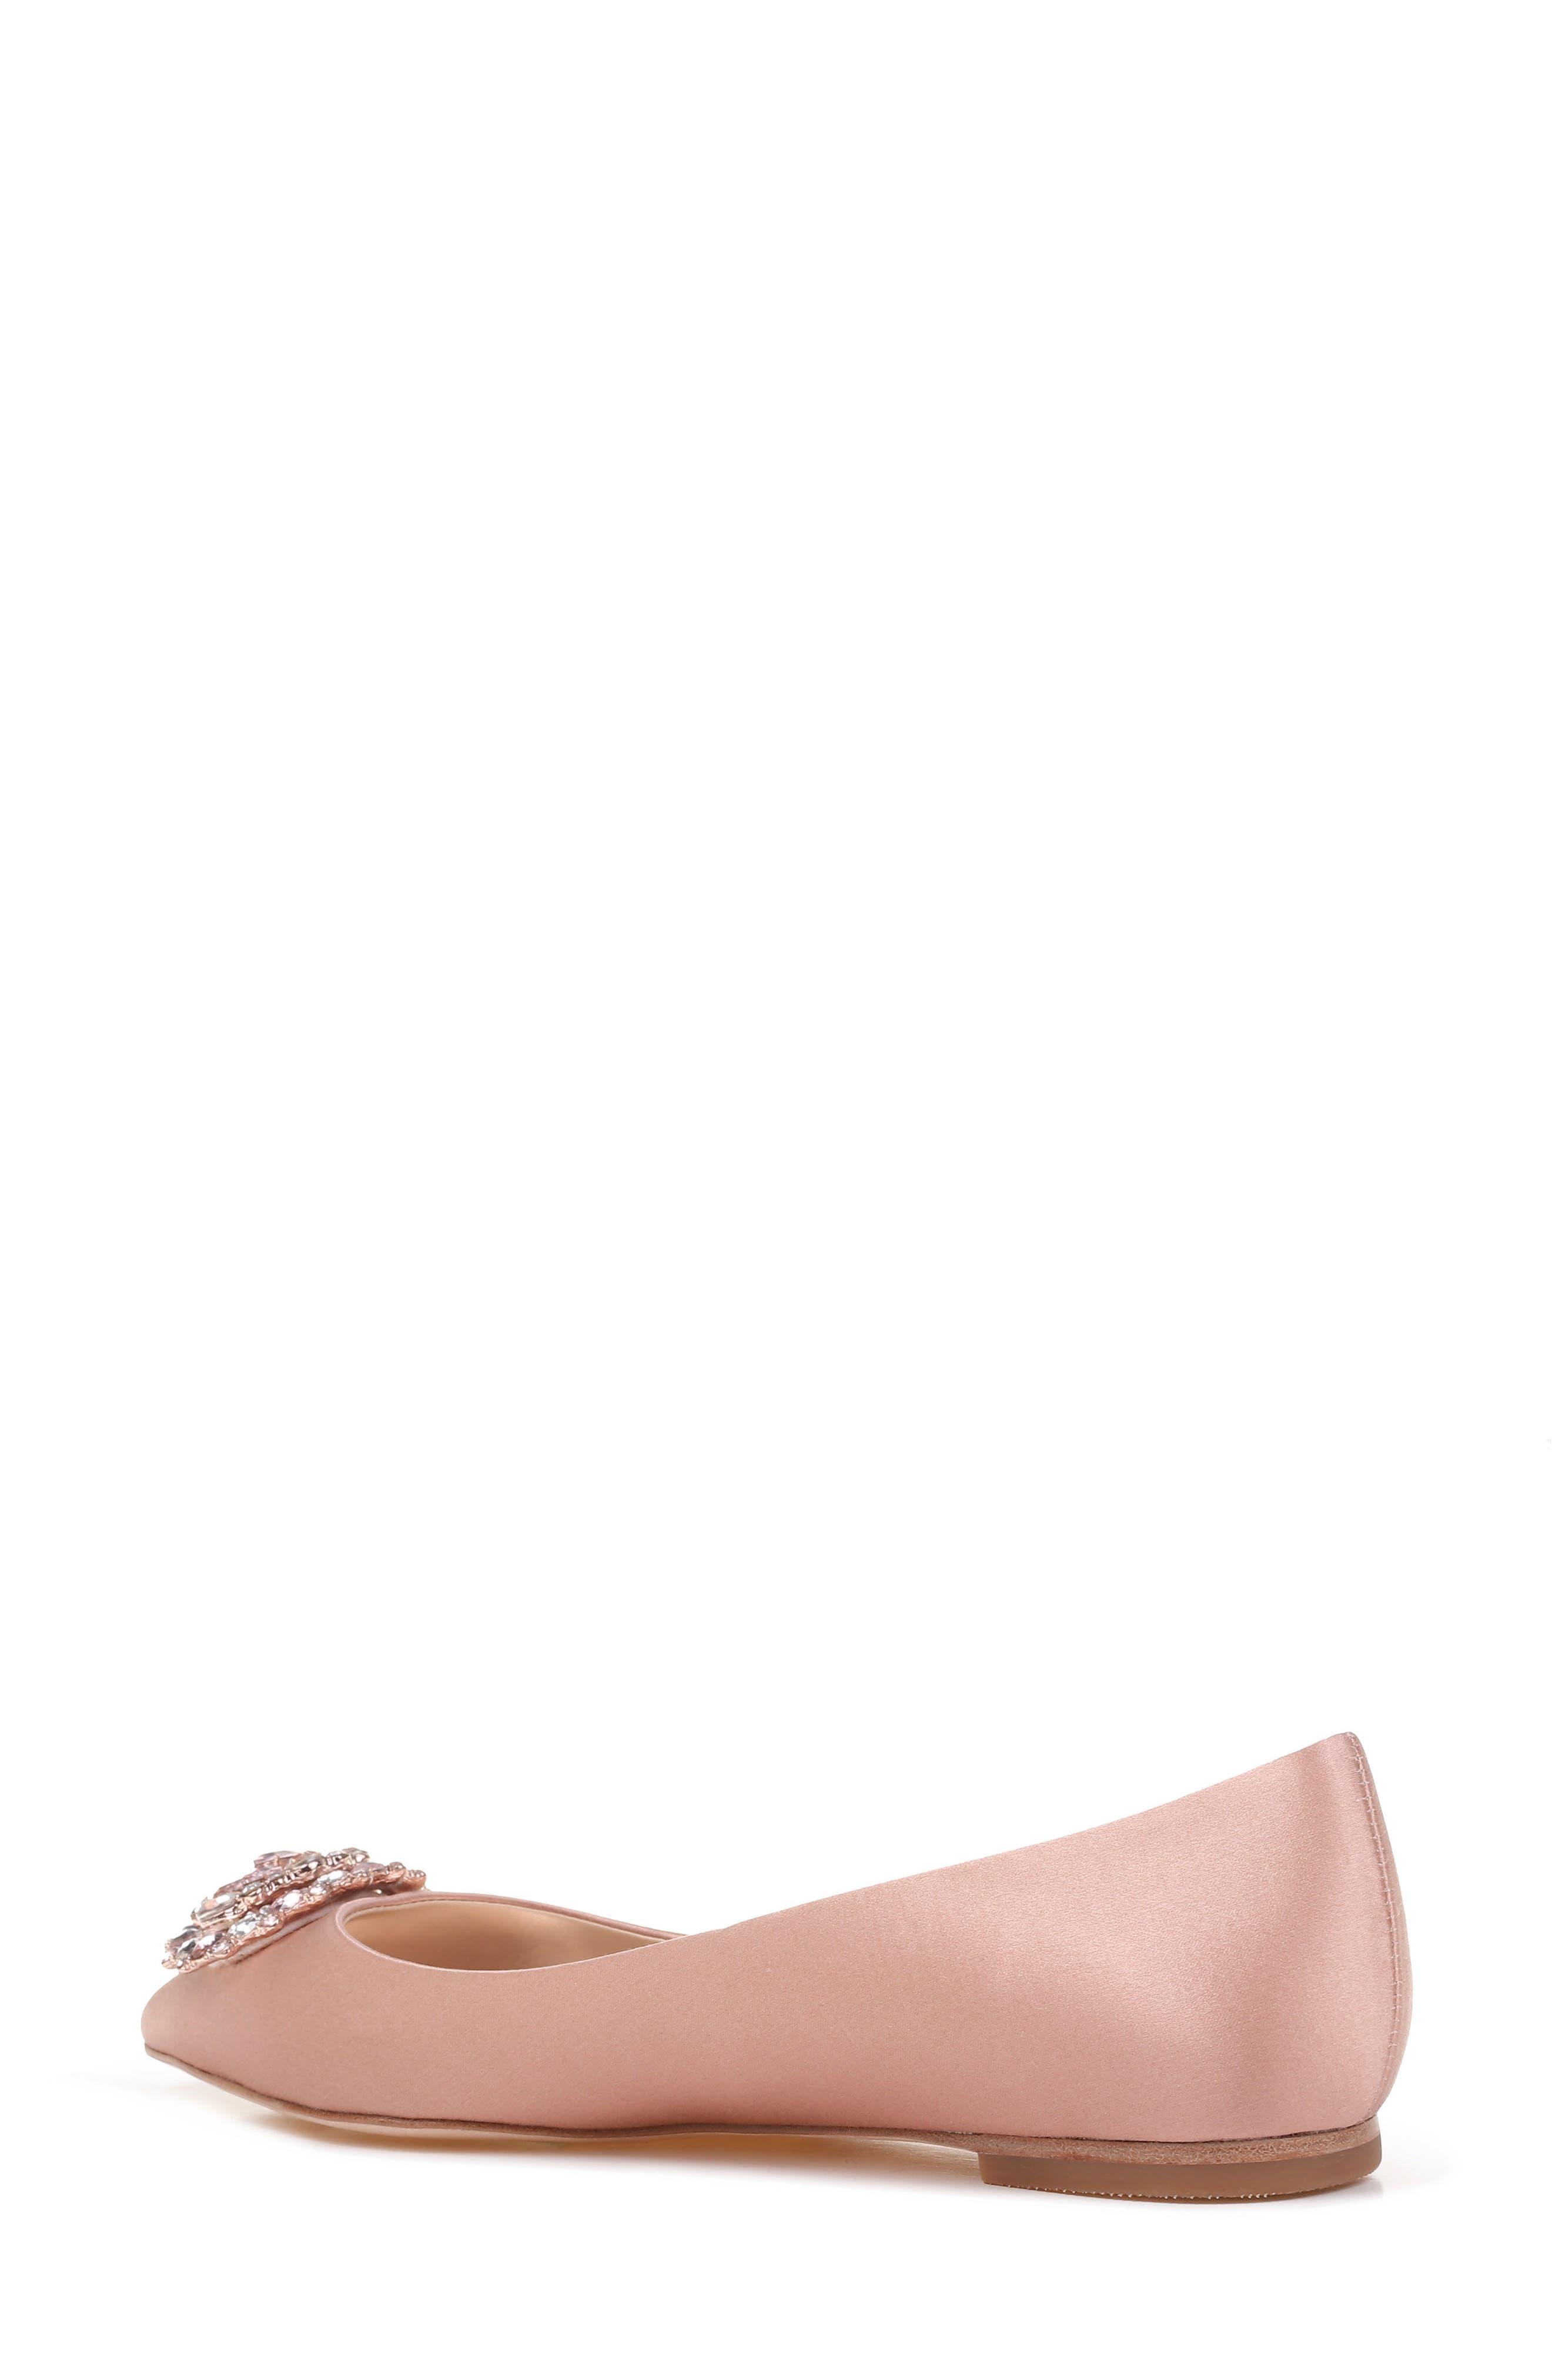 Alternate Image 2  - Badgley Mischka 'Davis' Crystal Embellished Pointy Toe Flat (Women)